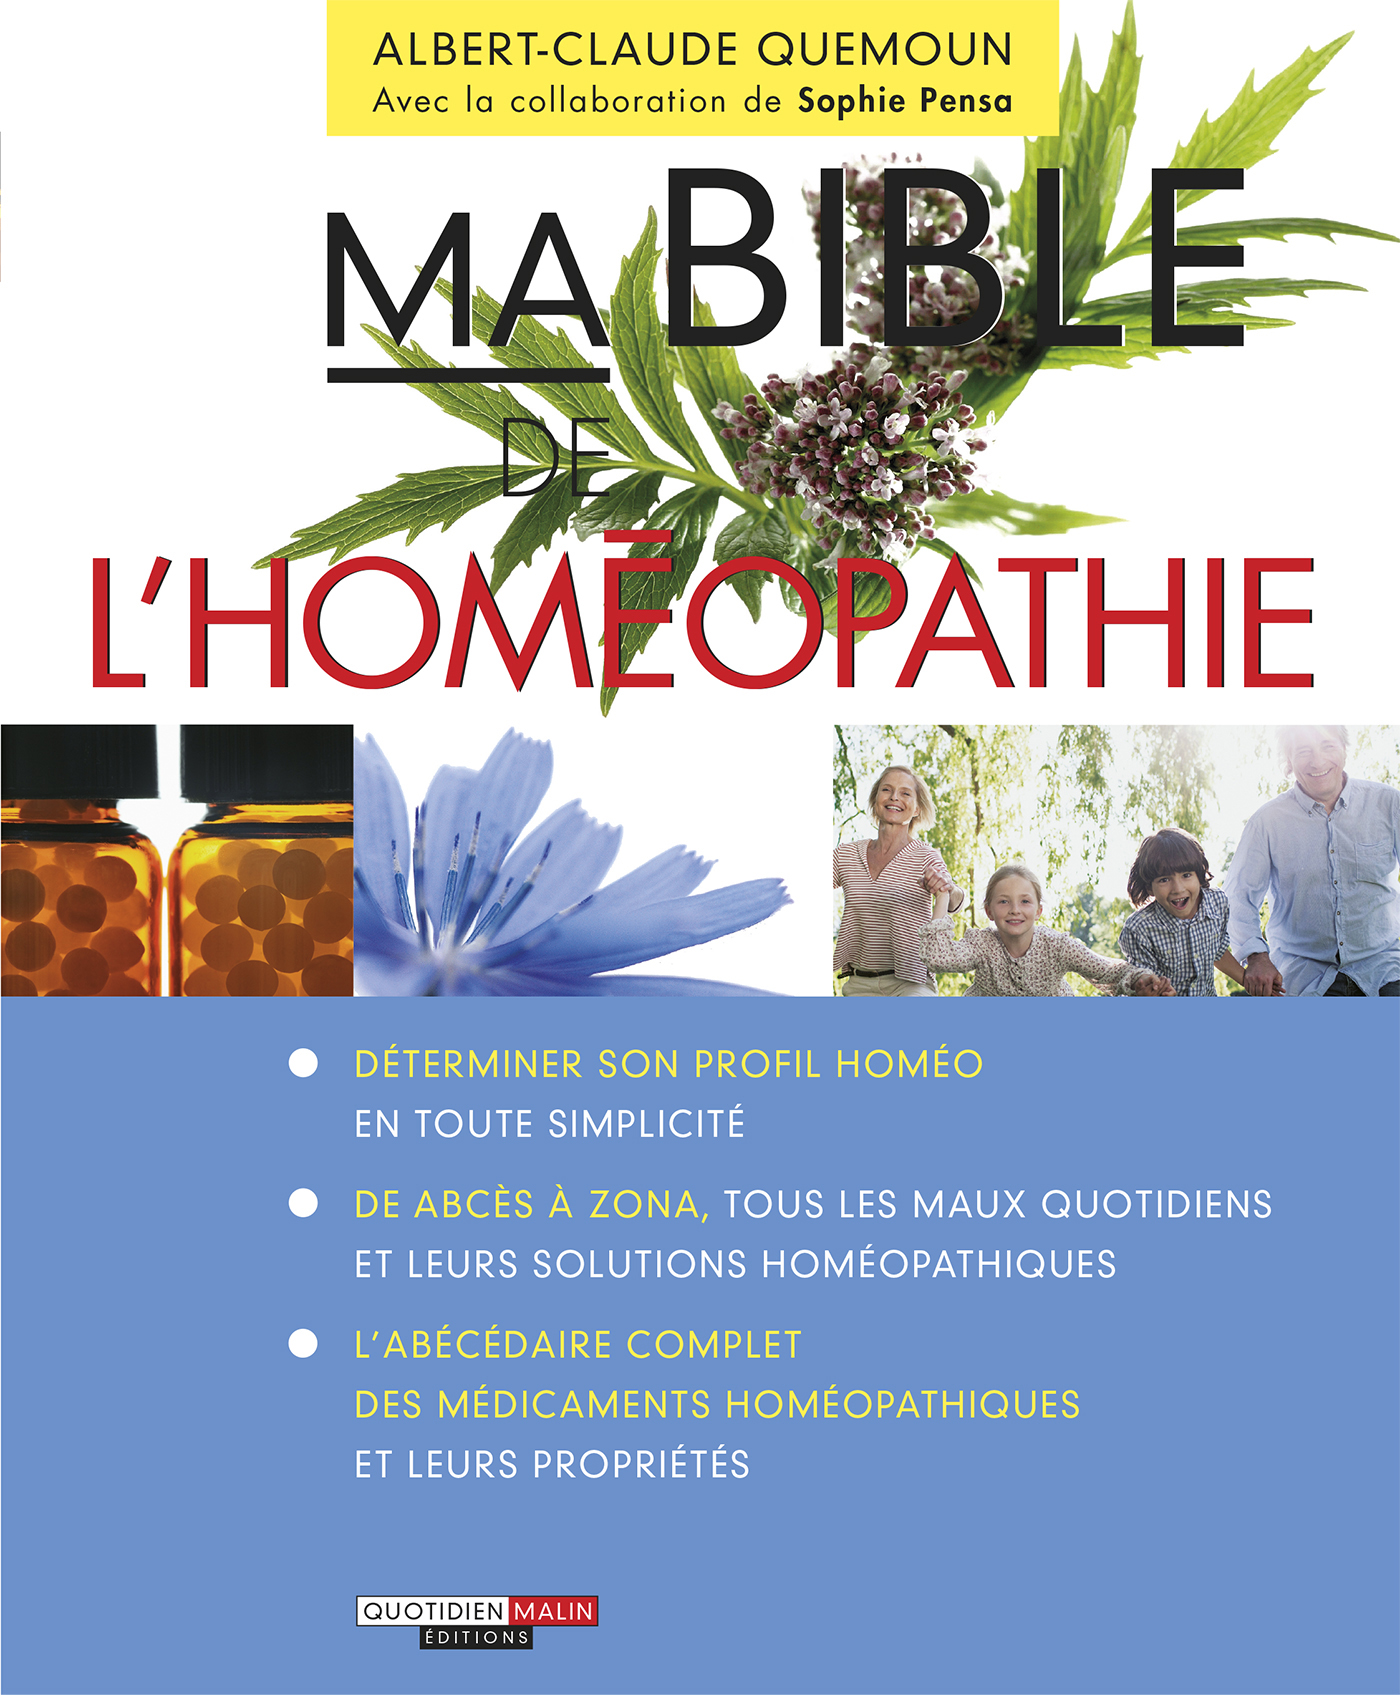 Terrains Homeopathiques